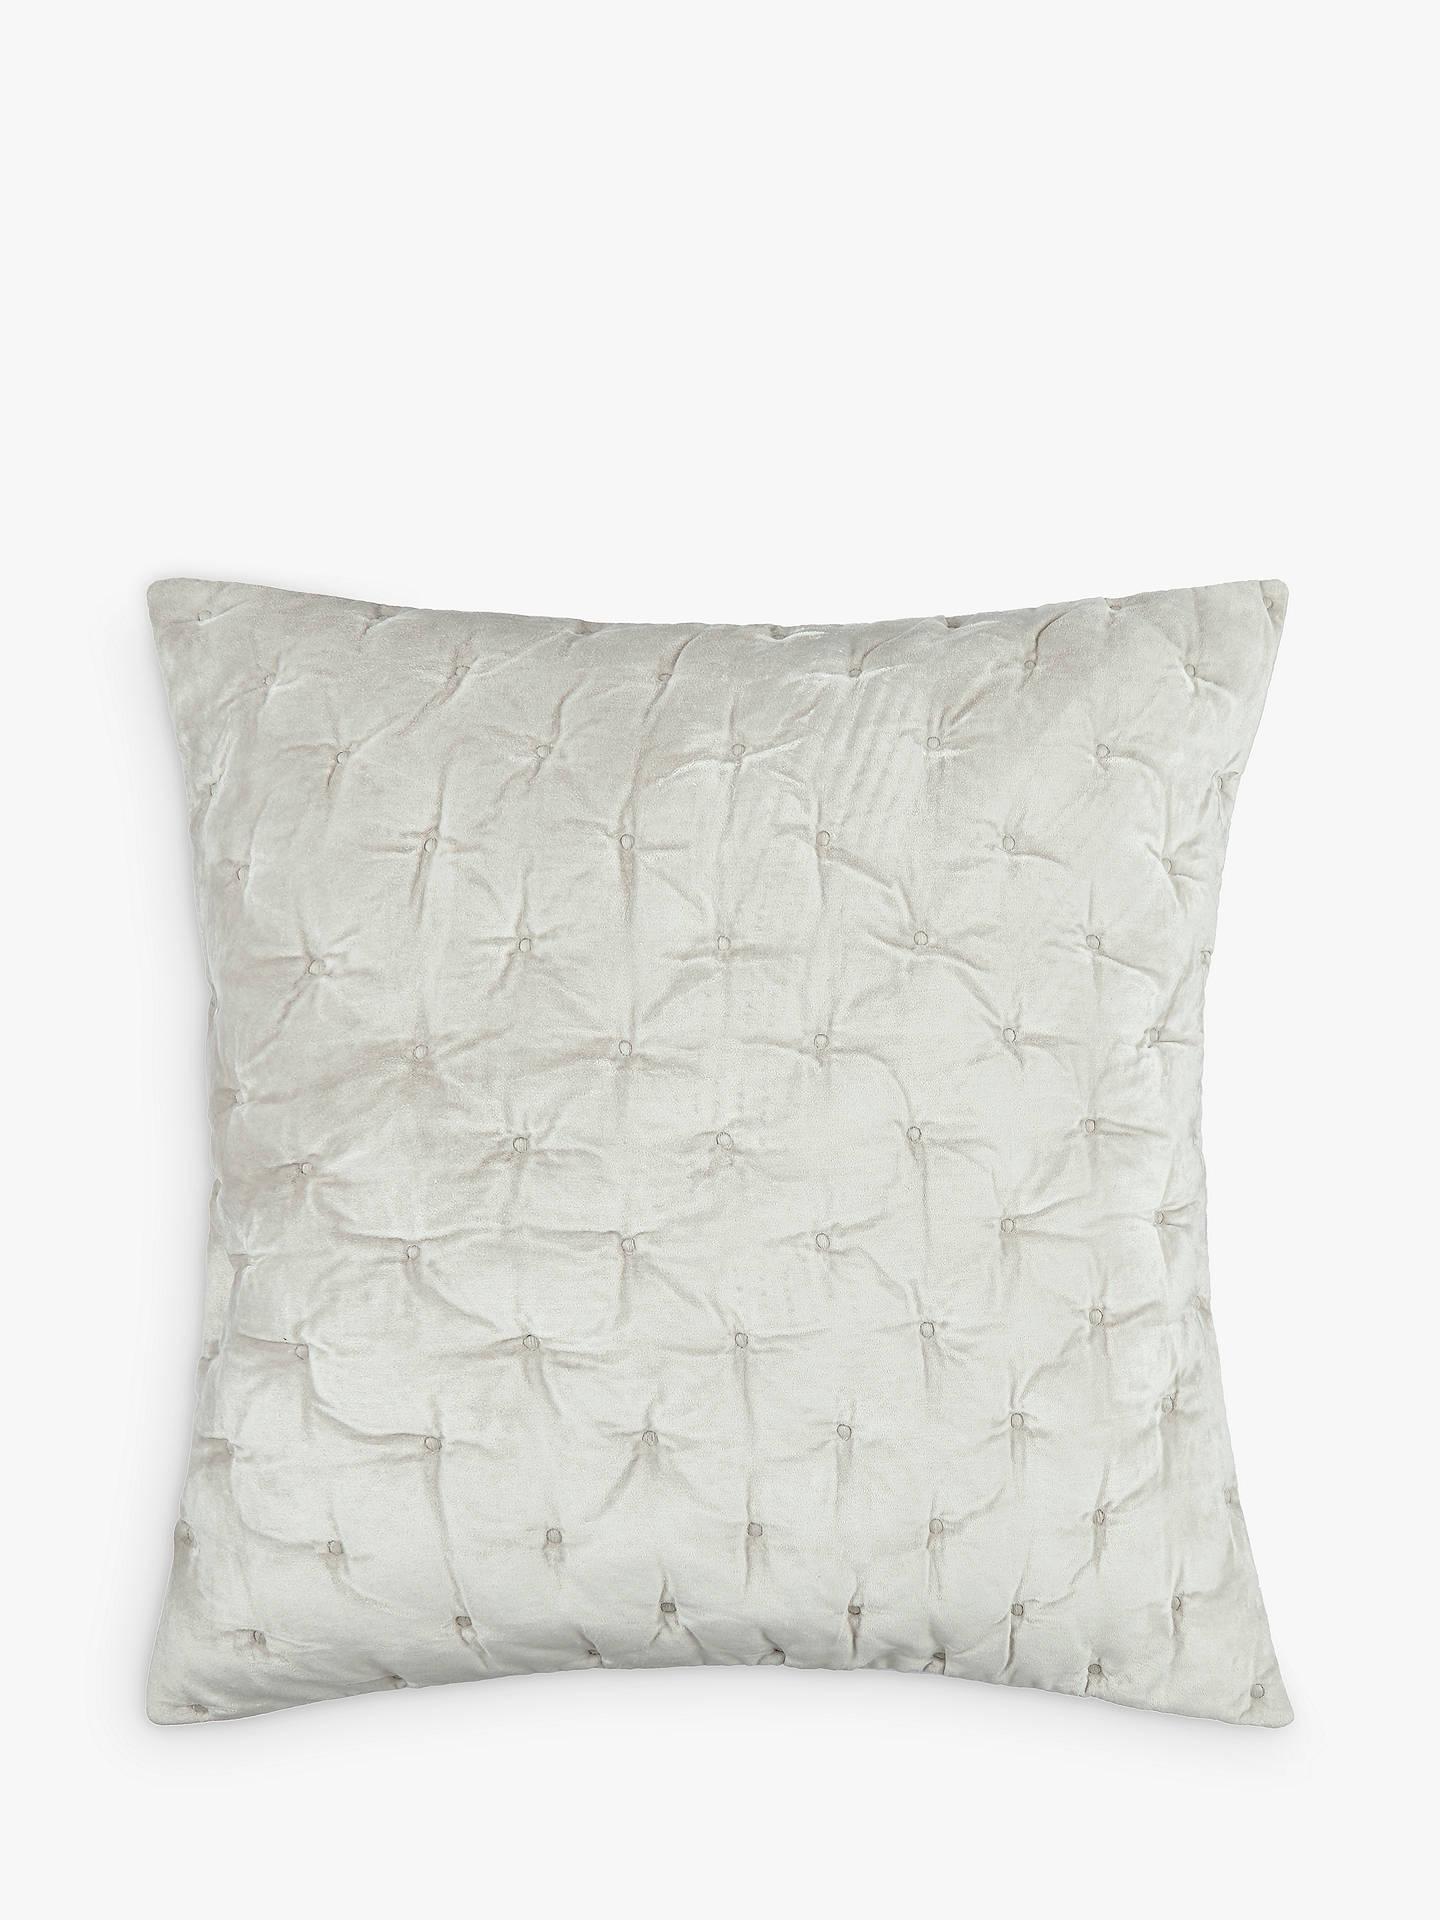 john lewis partners velvet stitch cushion cover at john. Black Bedroom Furniture Sets. Home Design Ideas